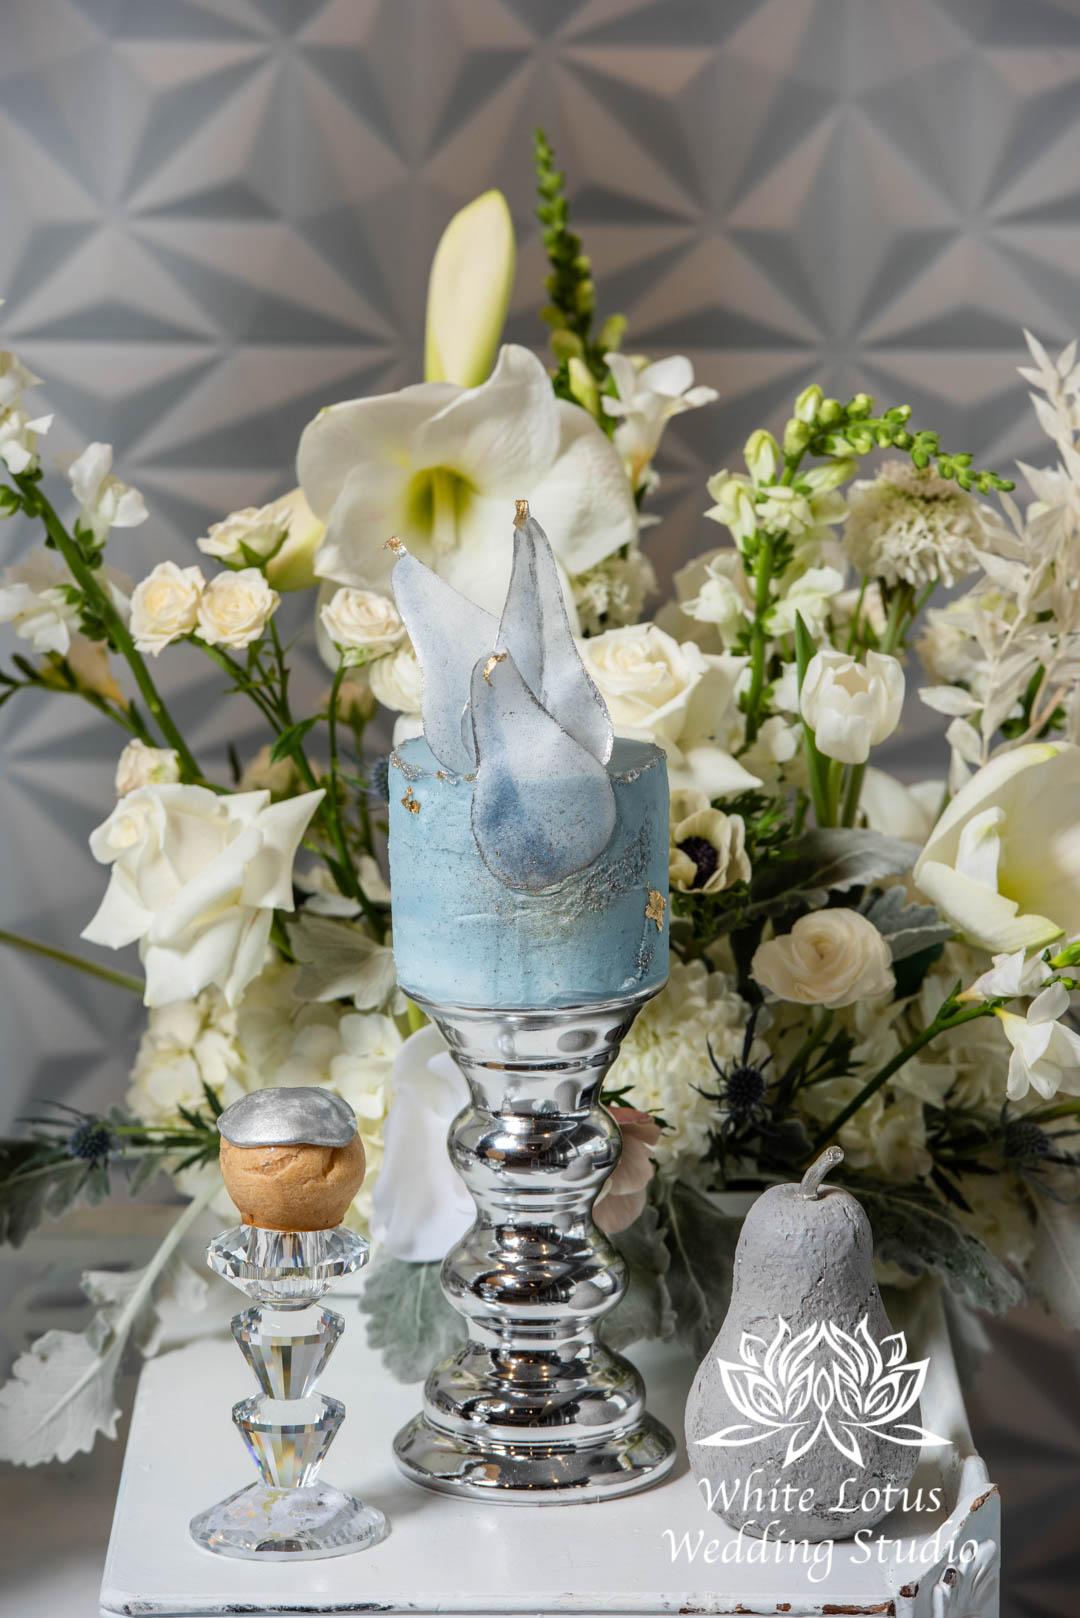 097- GLAM WINTERLUXE WEDDING INSPIRATION